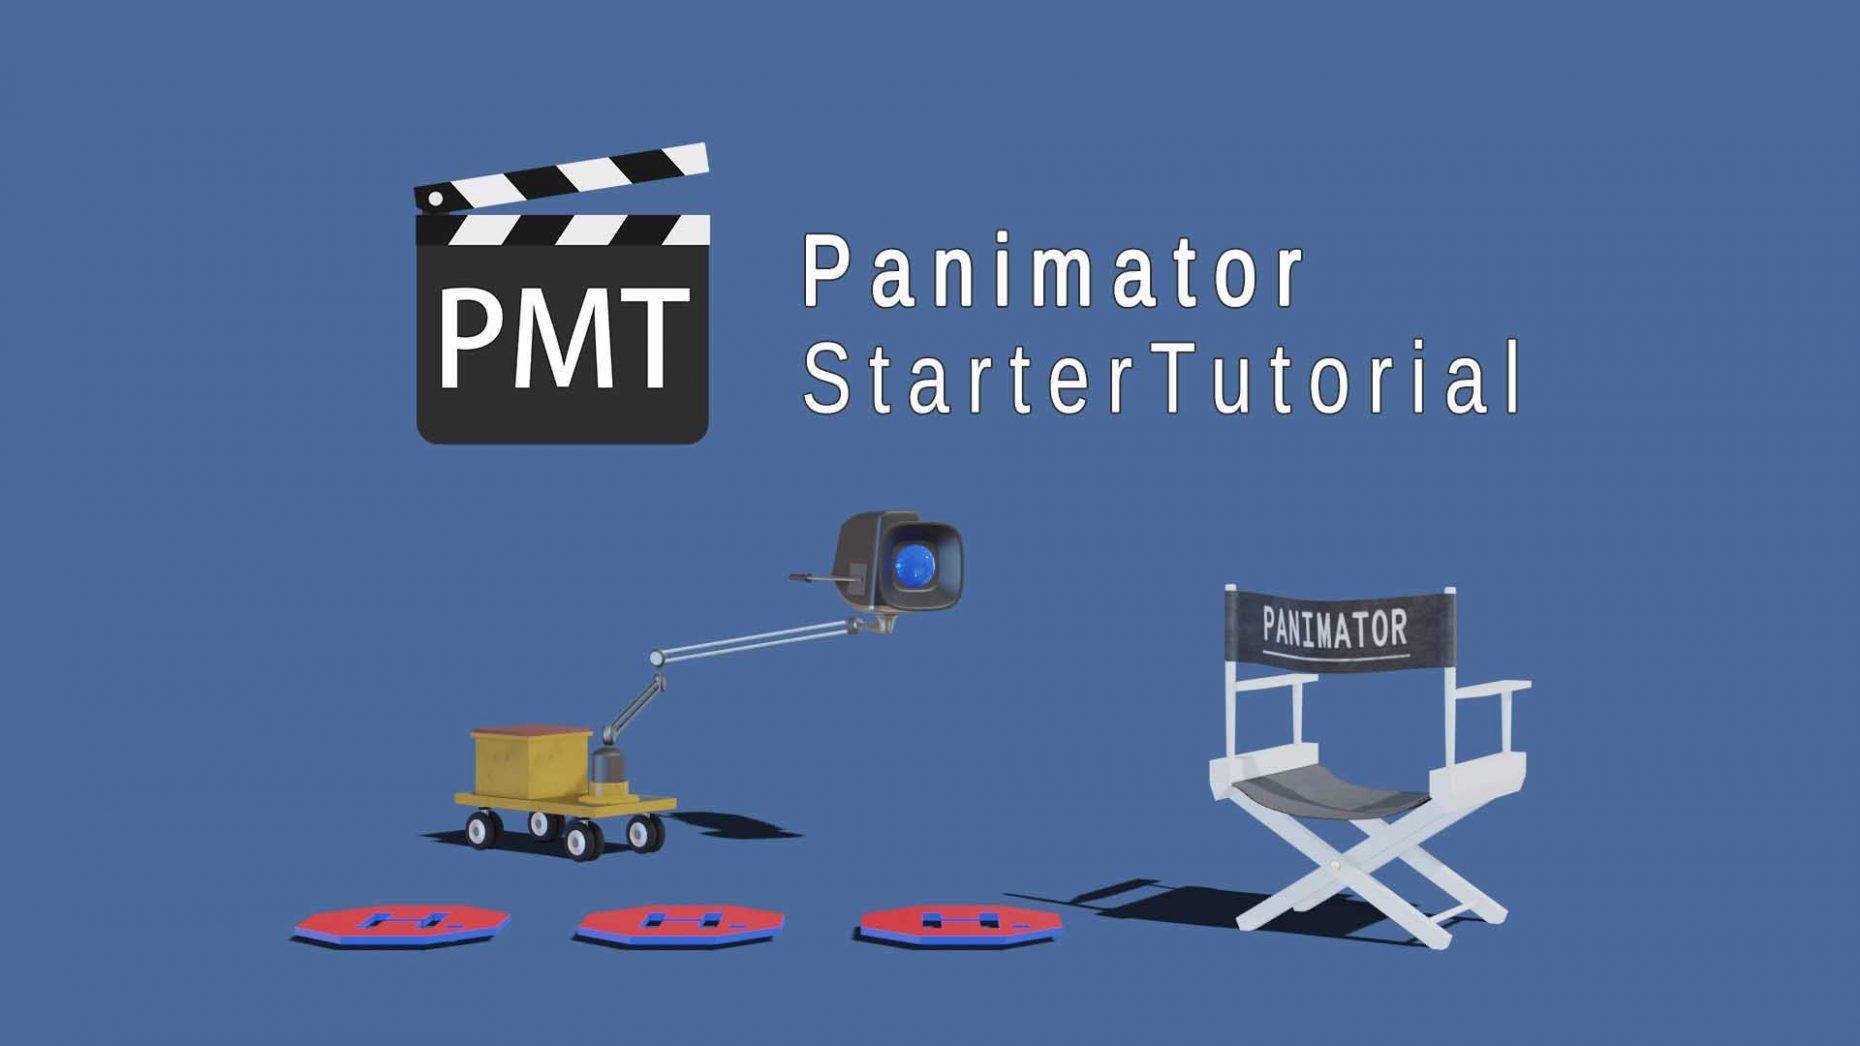 Panimator starter tutorial